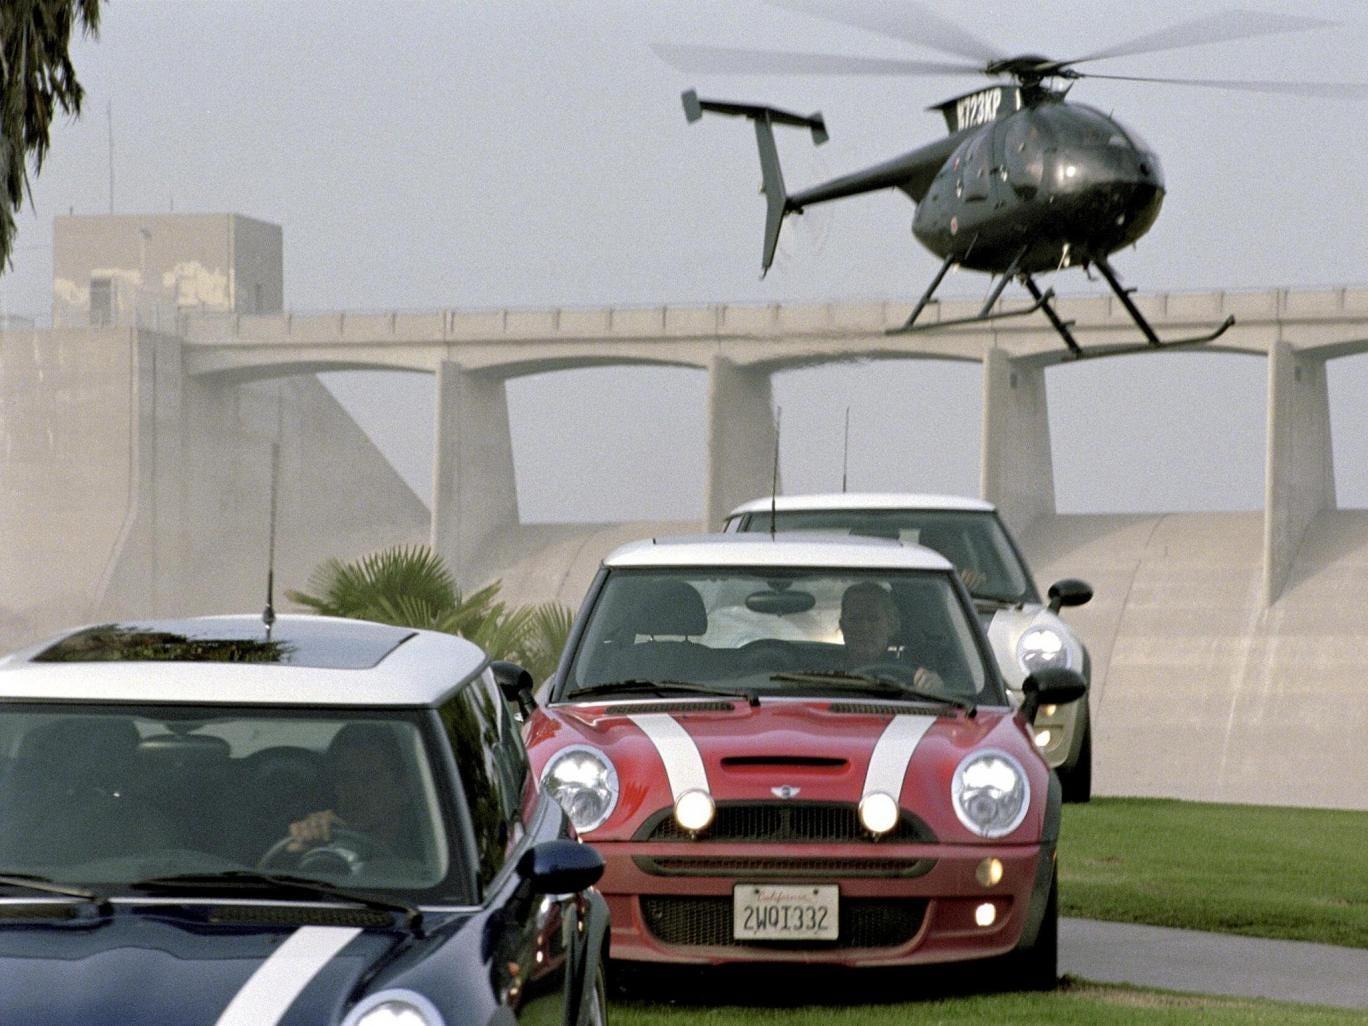 The quartet used Mini Coopers to make their getaway like the film 'The Italian Job' (2003)